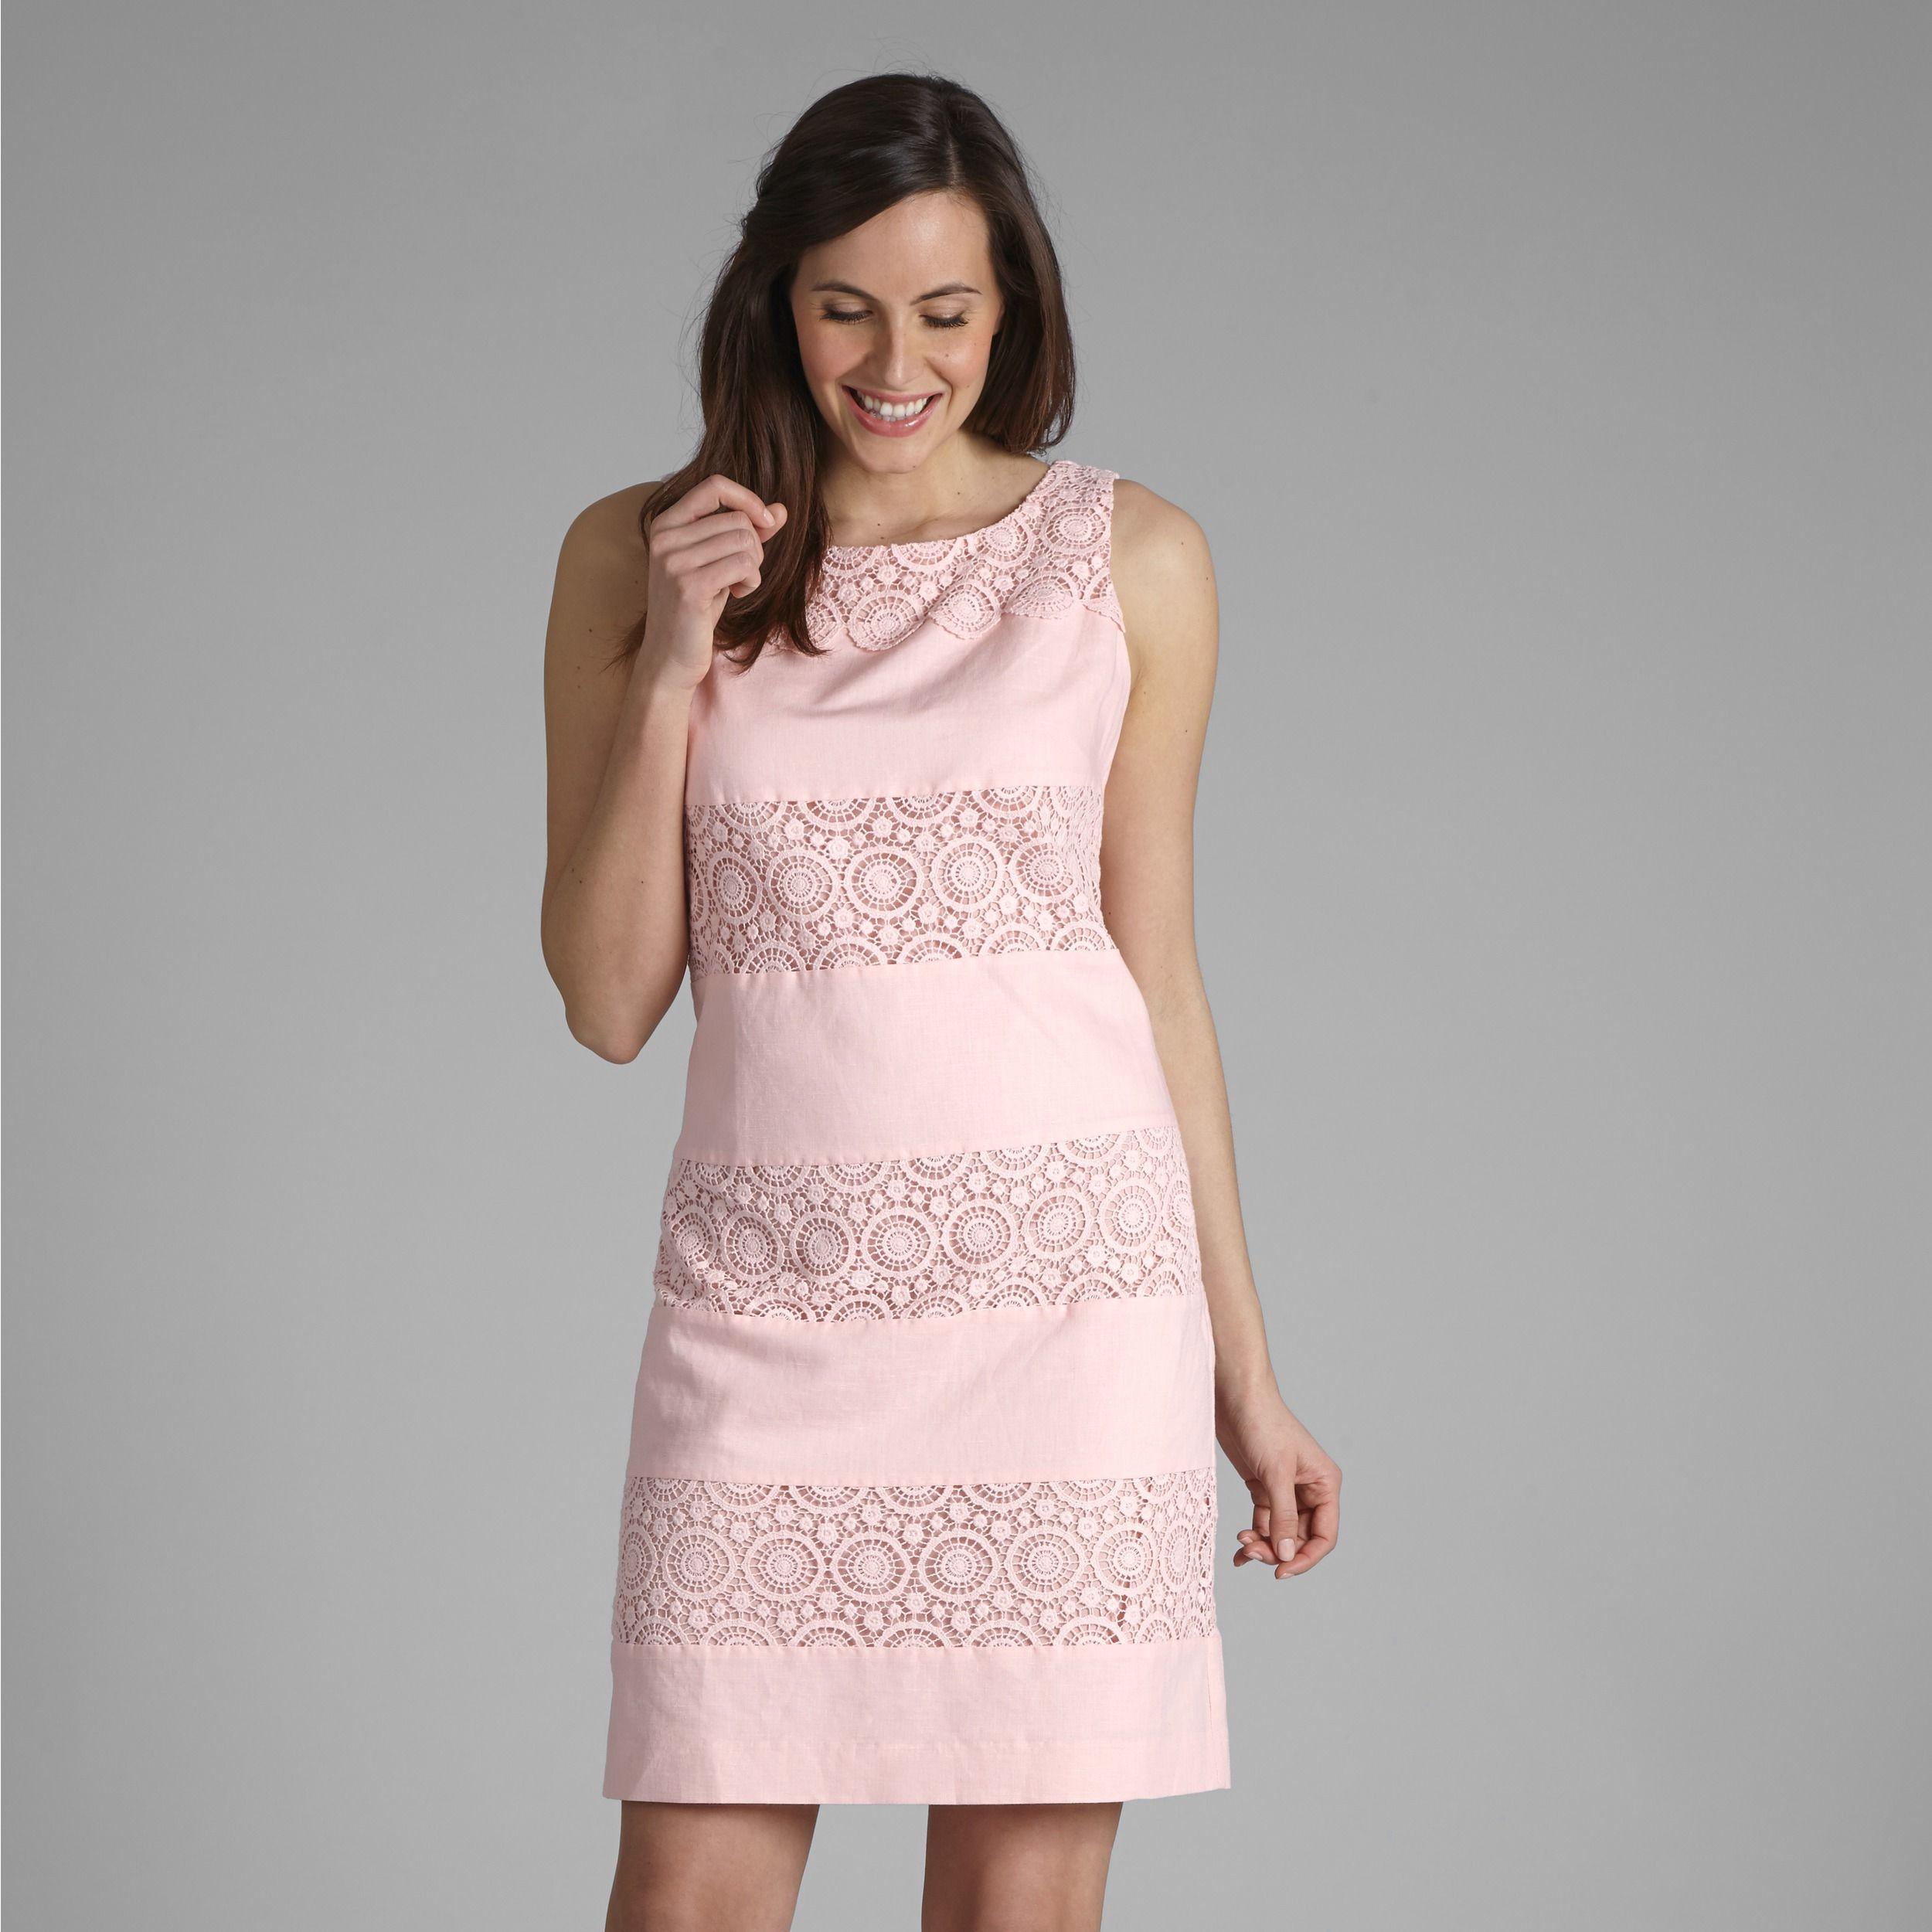 Broderie Stripe Linen Shift Dress at Laura Ashley | Elegant clothes ...